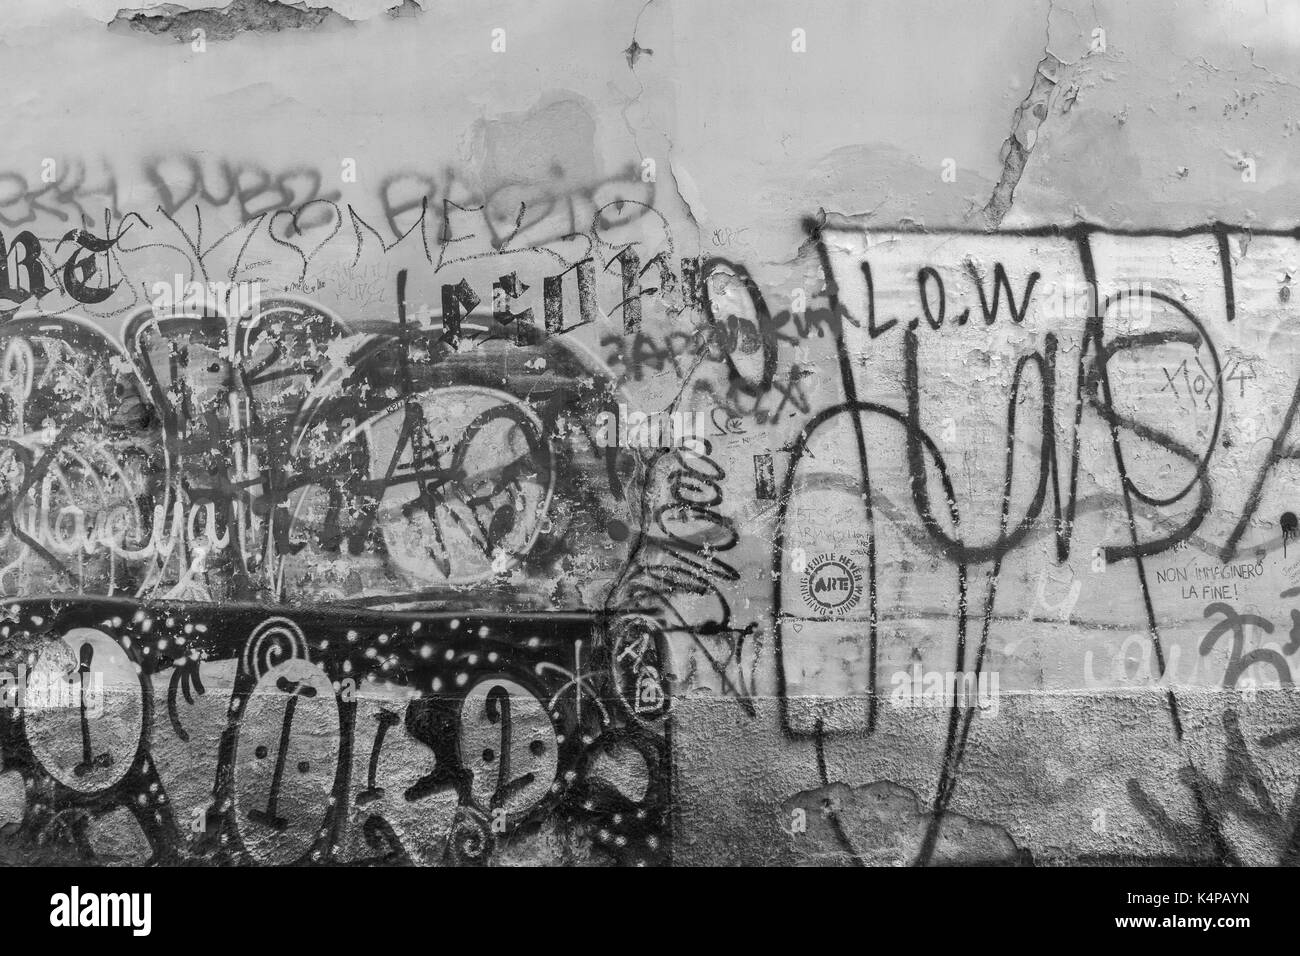 graffiti tags stockfotos graffiti tags bilder alamy On spruhfarbe wand